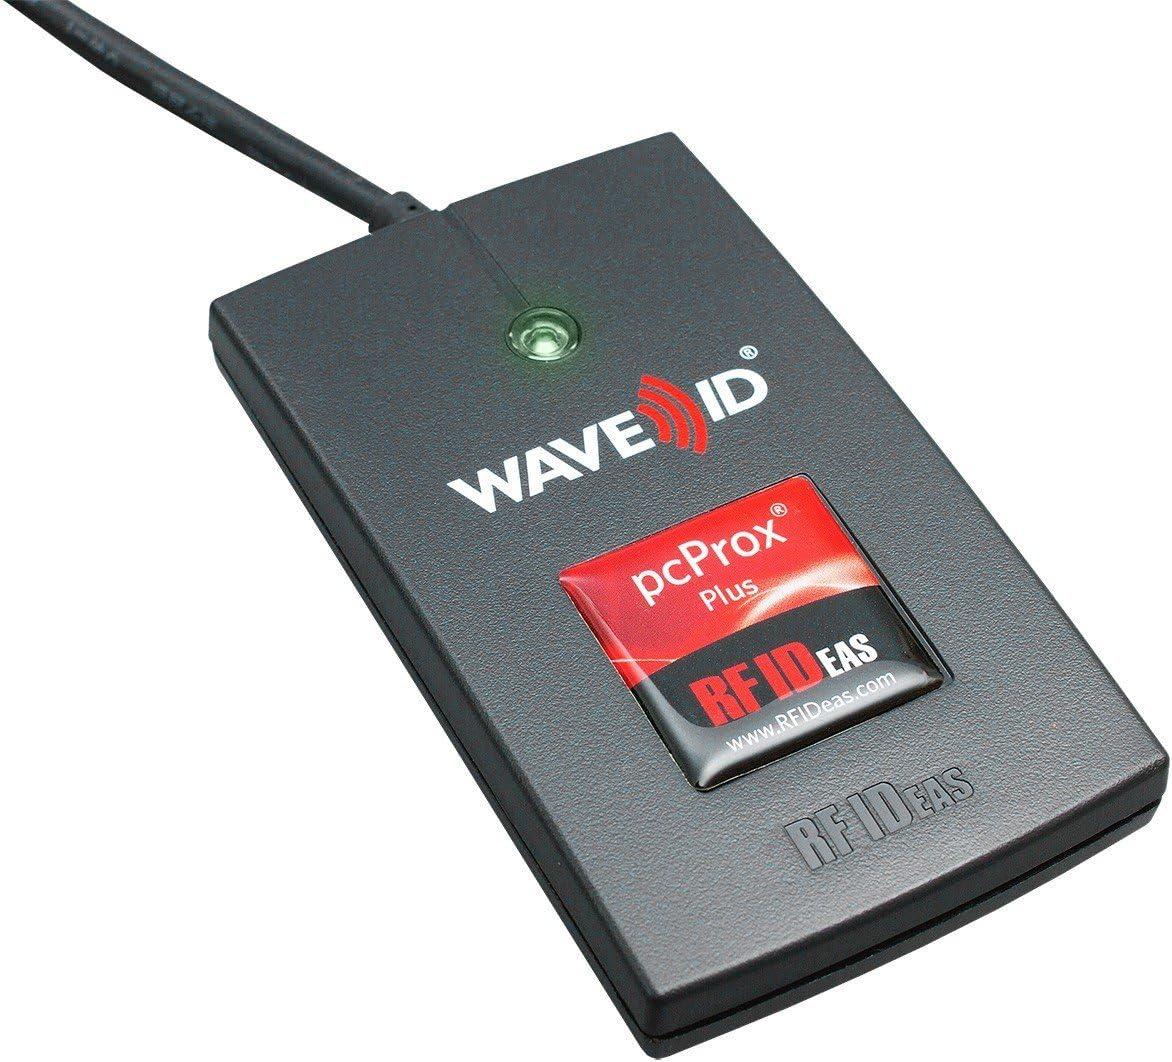 RF IDeas PCPROX Plus 82 Series USB Reader RDR-80582AKU